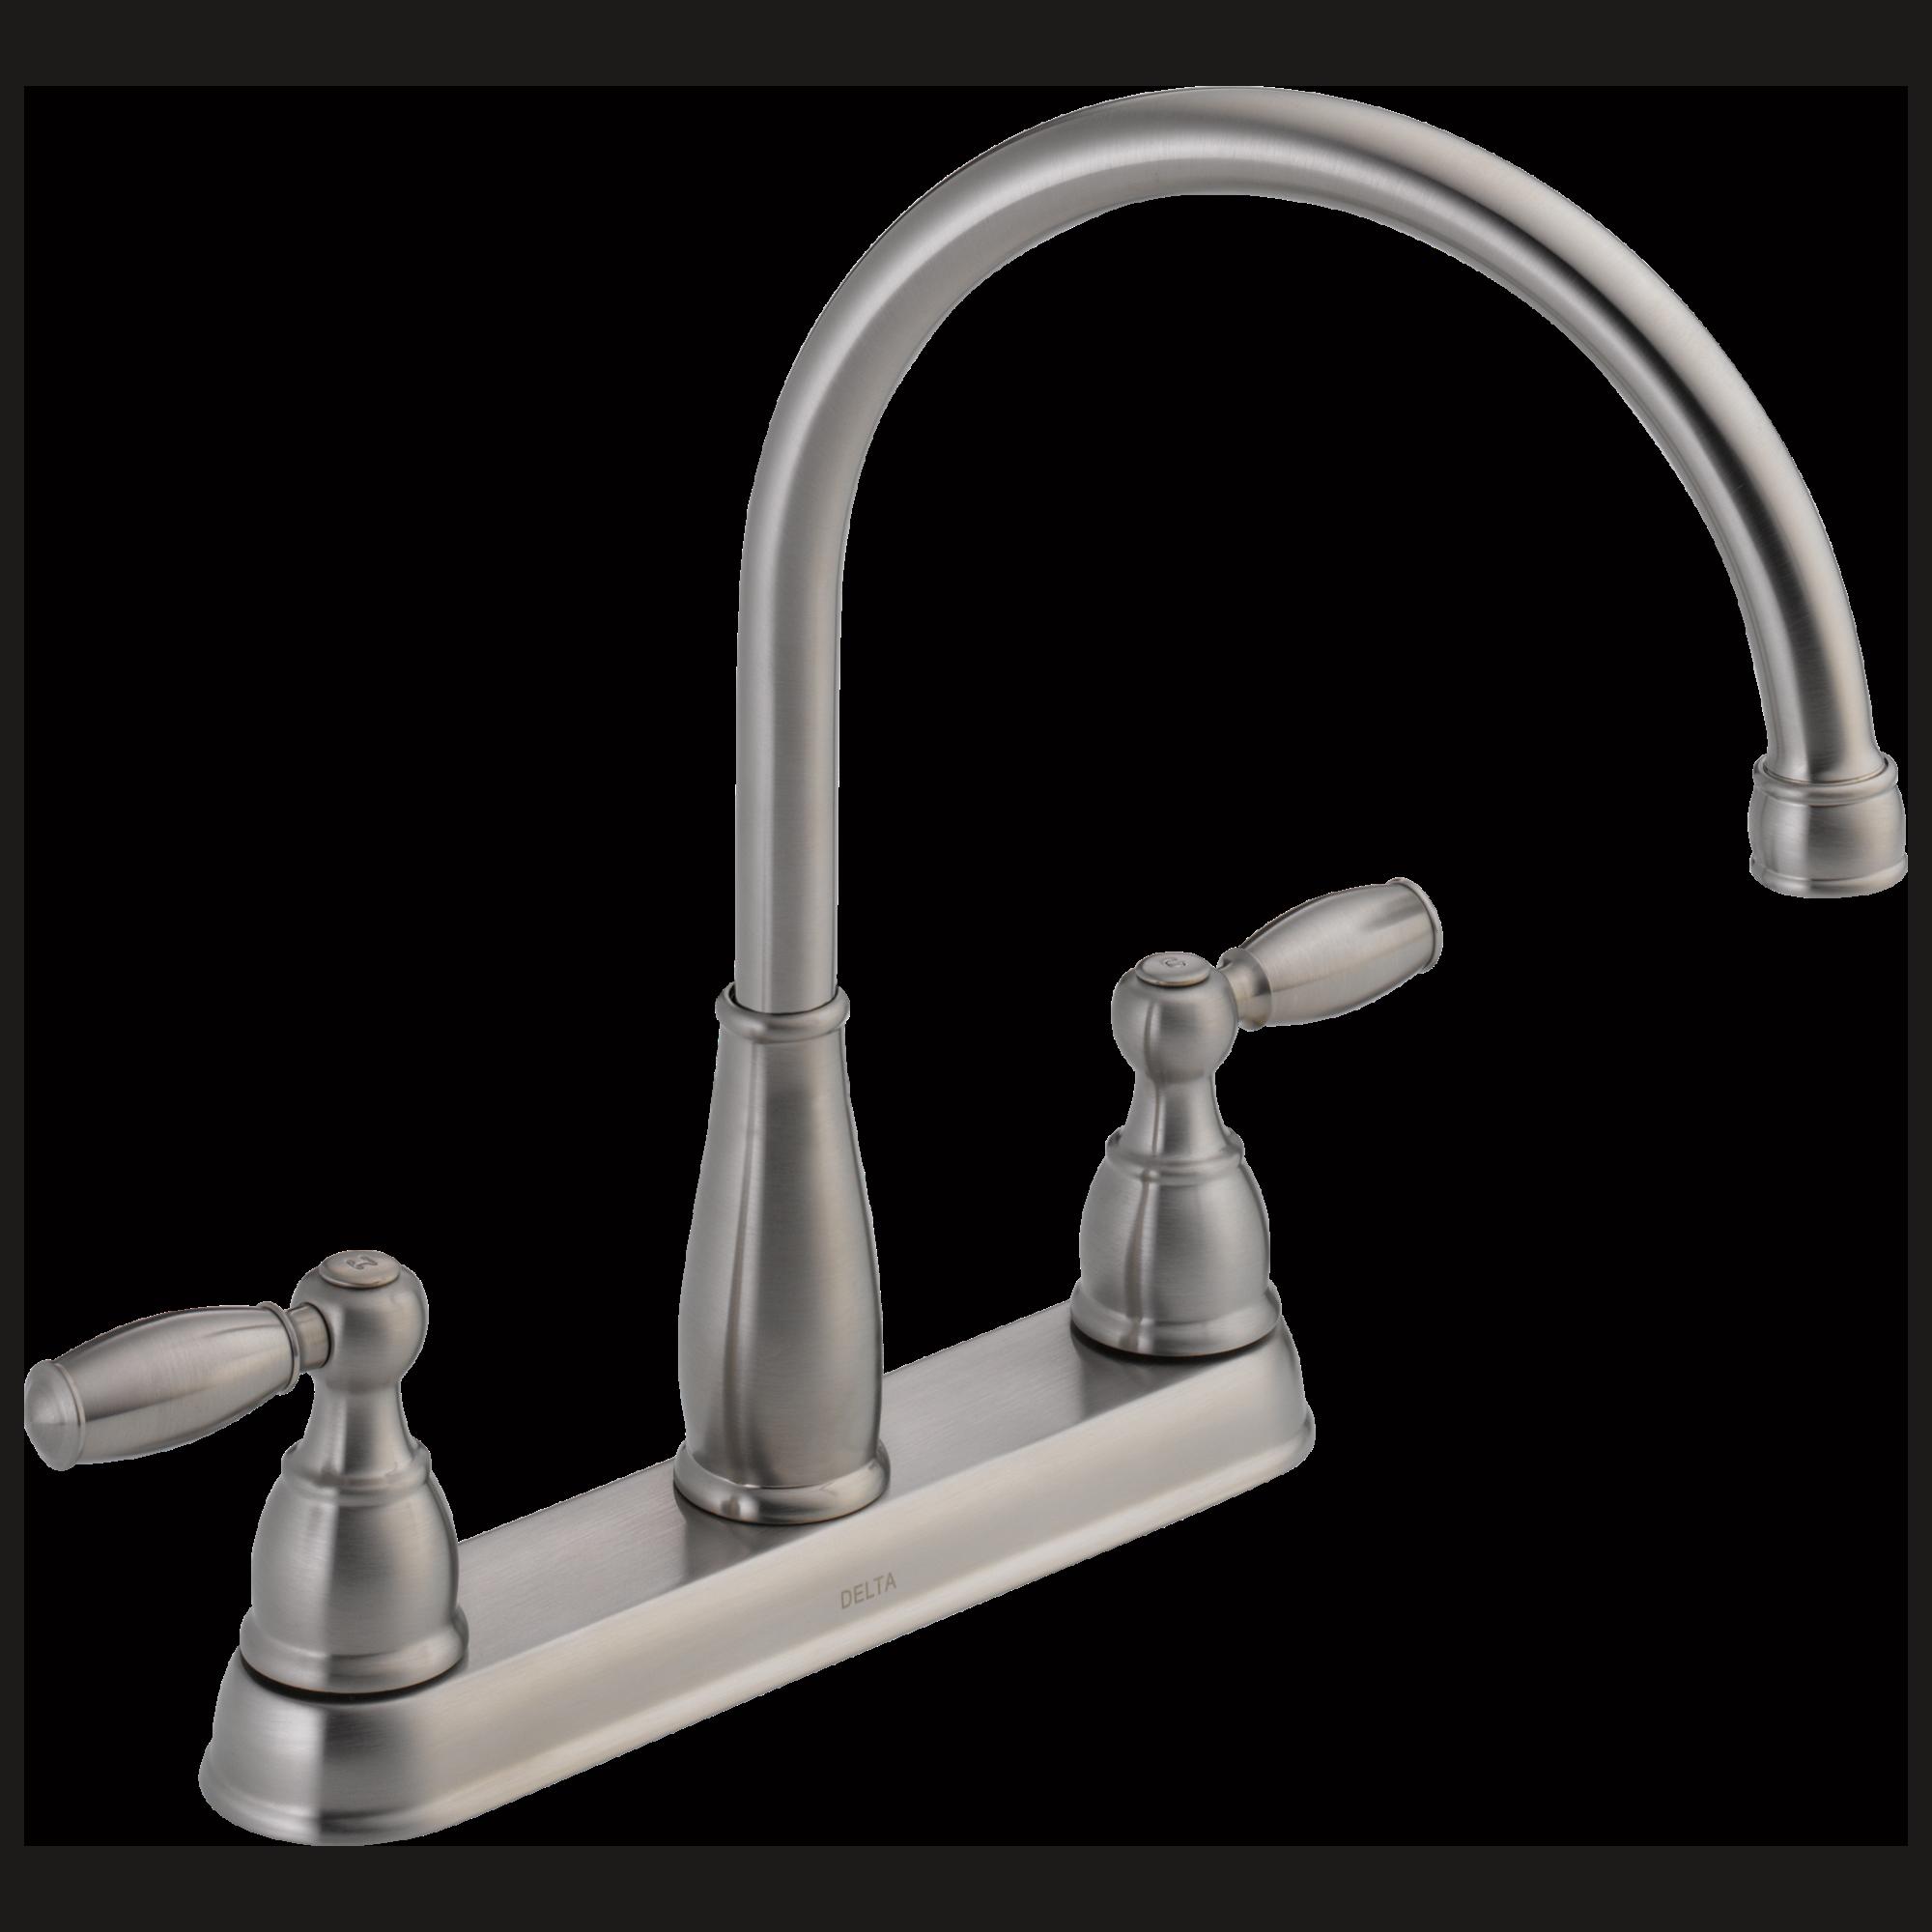 Delta Kitchen Faucets Warranty 21987lf Ss Two Handle Kitchen Faucet